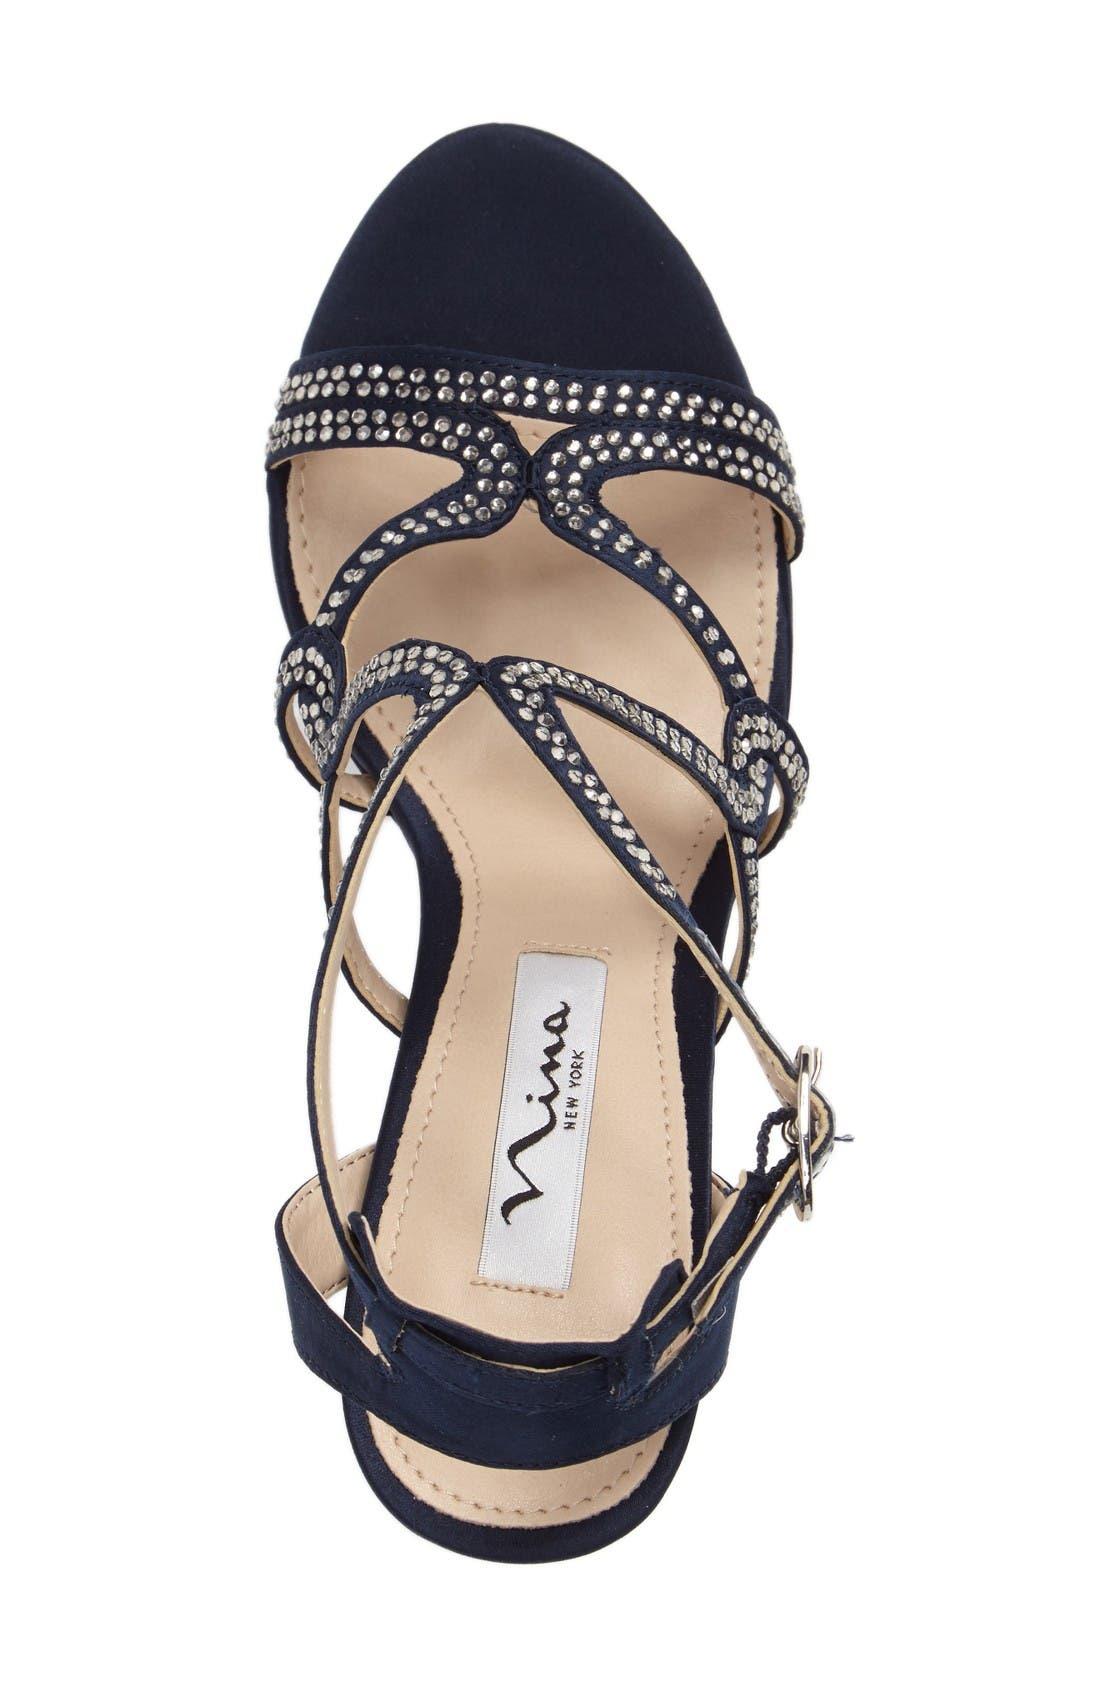 Varsha Crystal Embellished Evening Sandal,                             Alternate thumbnail 3, color,                             New Navy Satin